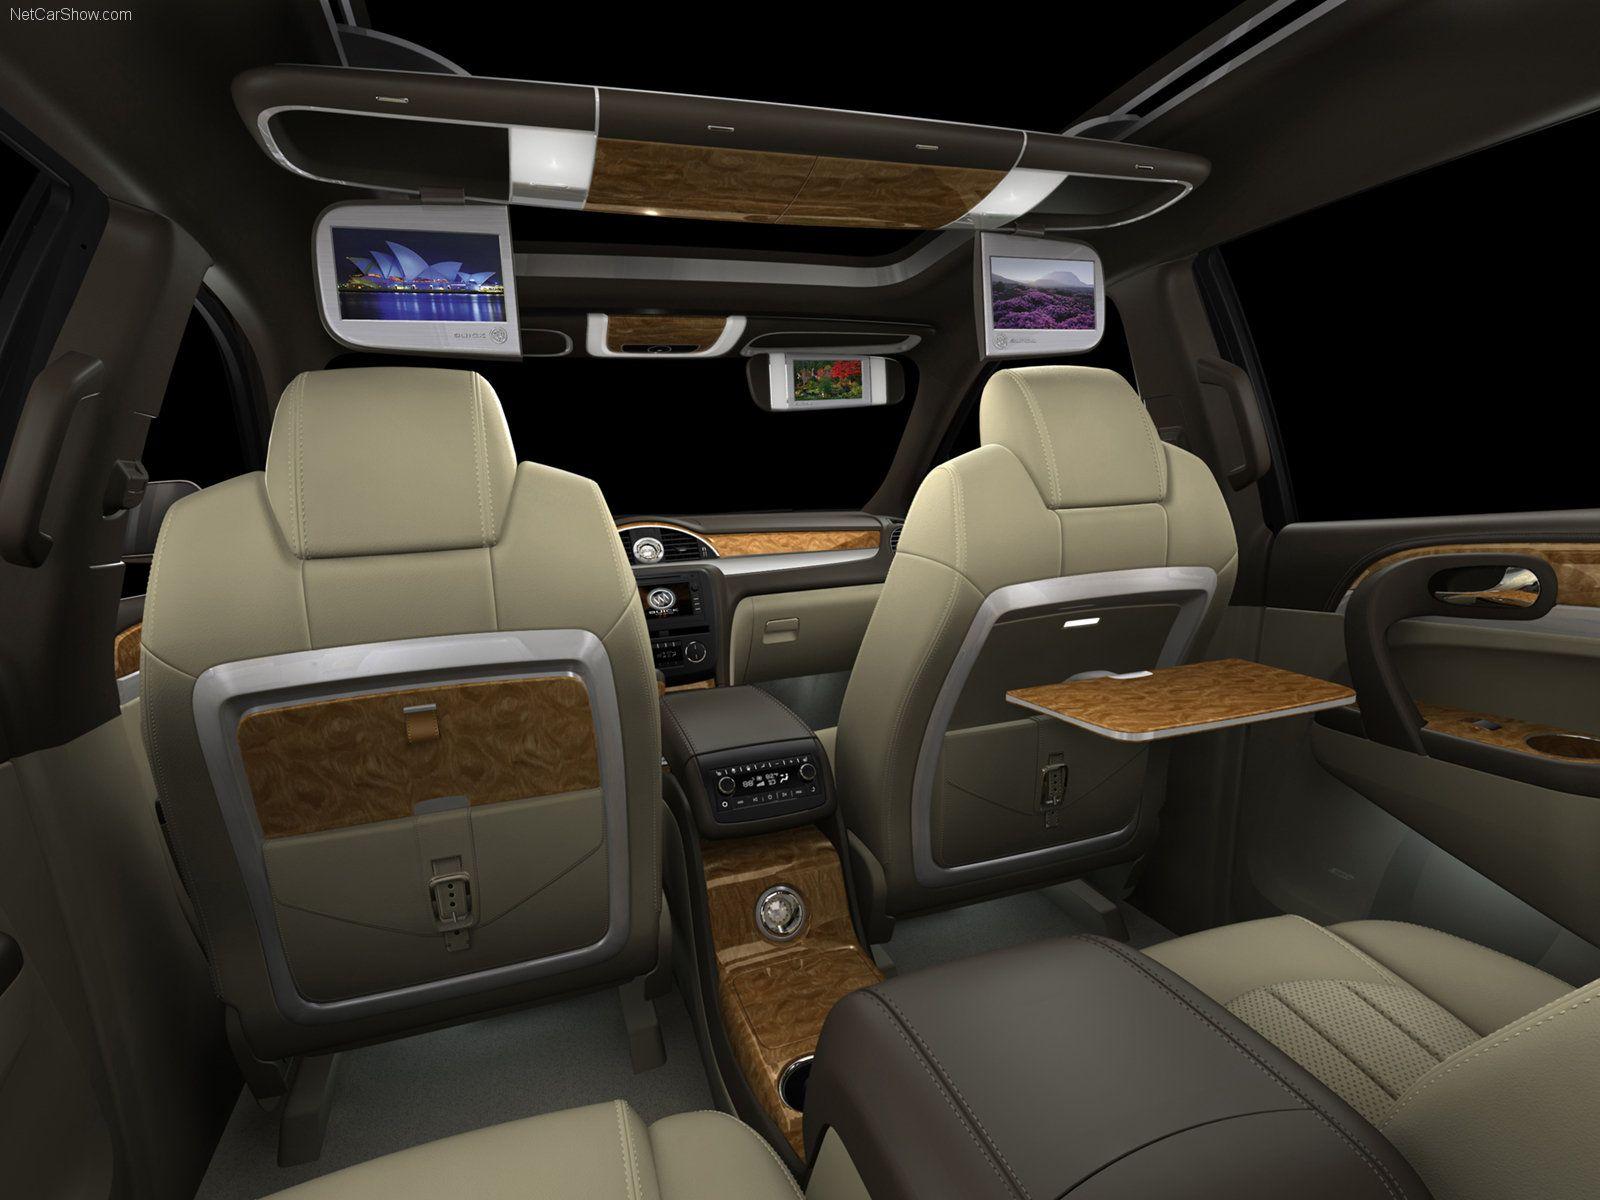 cars robb report s the enclave aveni future steer colors will motors avenir buick